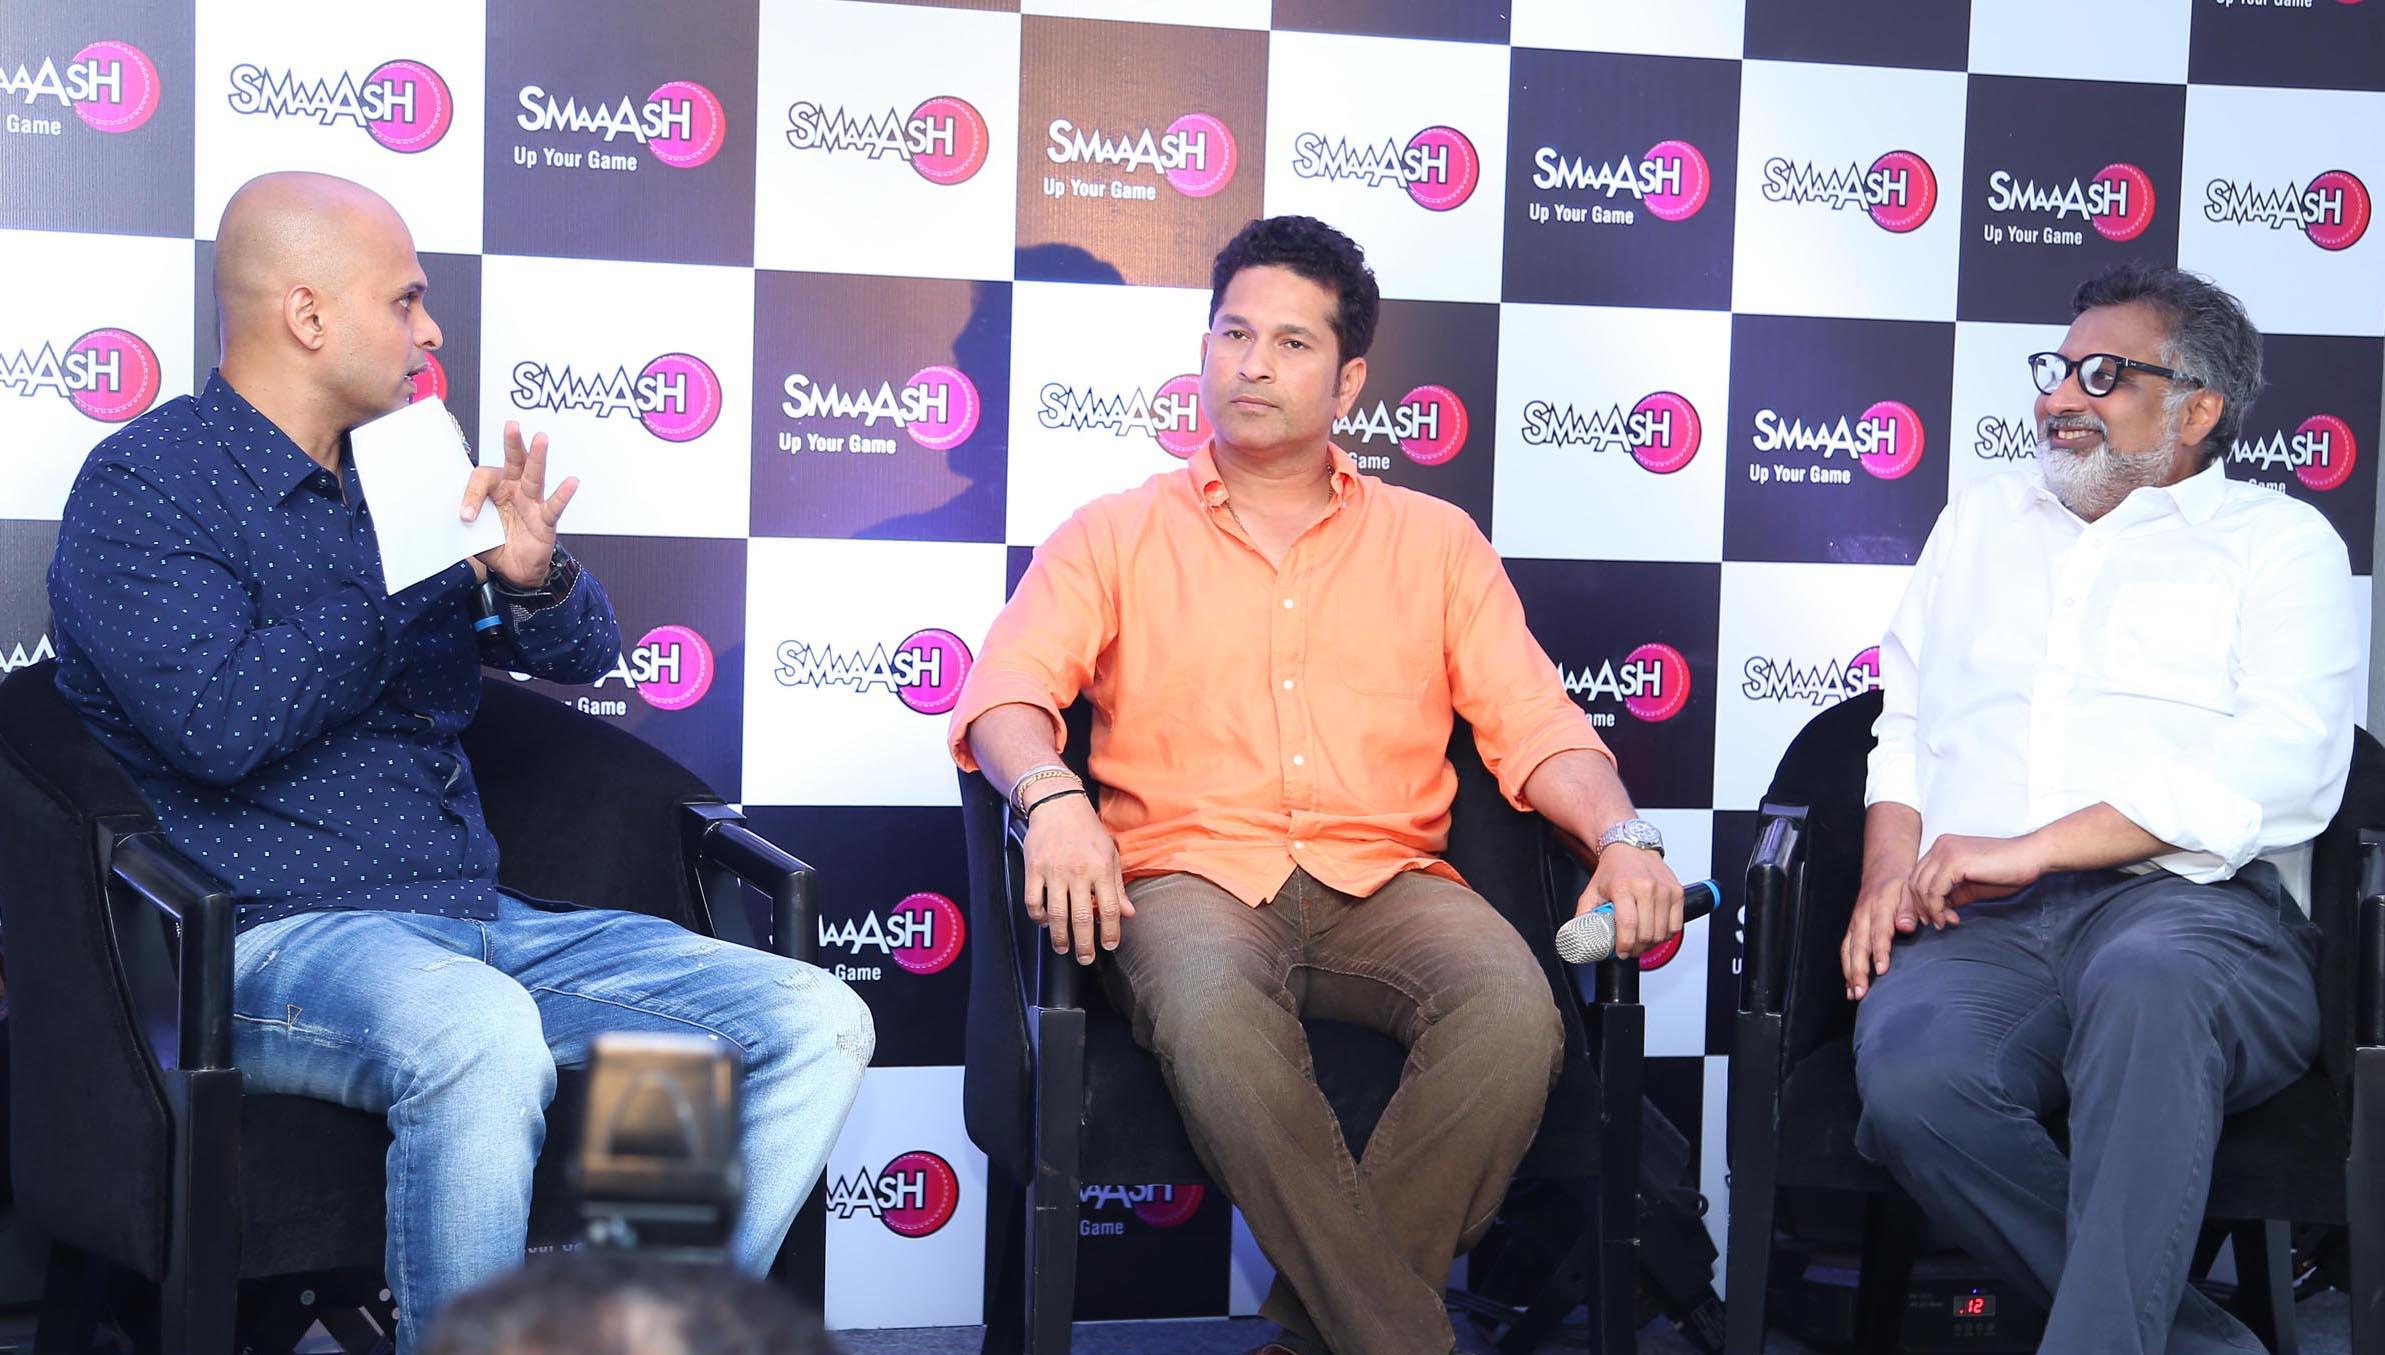 Author Vikram Sathaye, Sachin Tendulkar & Shripal Morakhia, Chief Imagination Officer, Smaaash, at the launch of premier urban sports park - Smaaash, at Inorbit Mall on Tuesday.